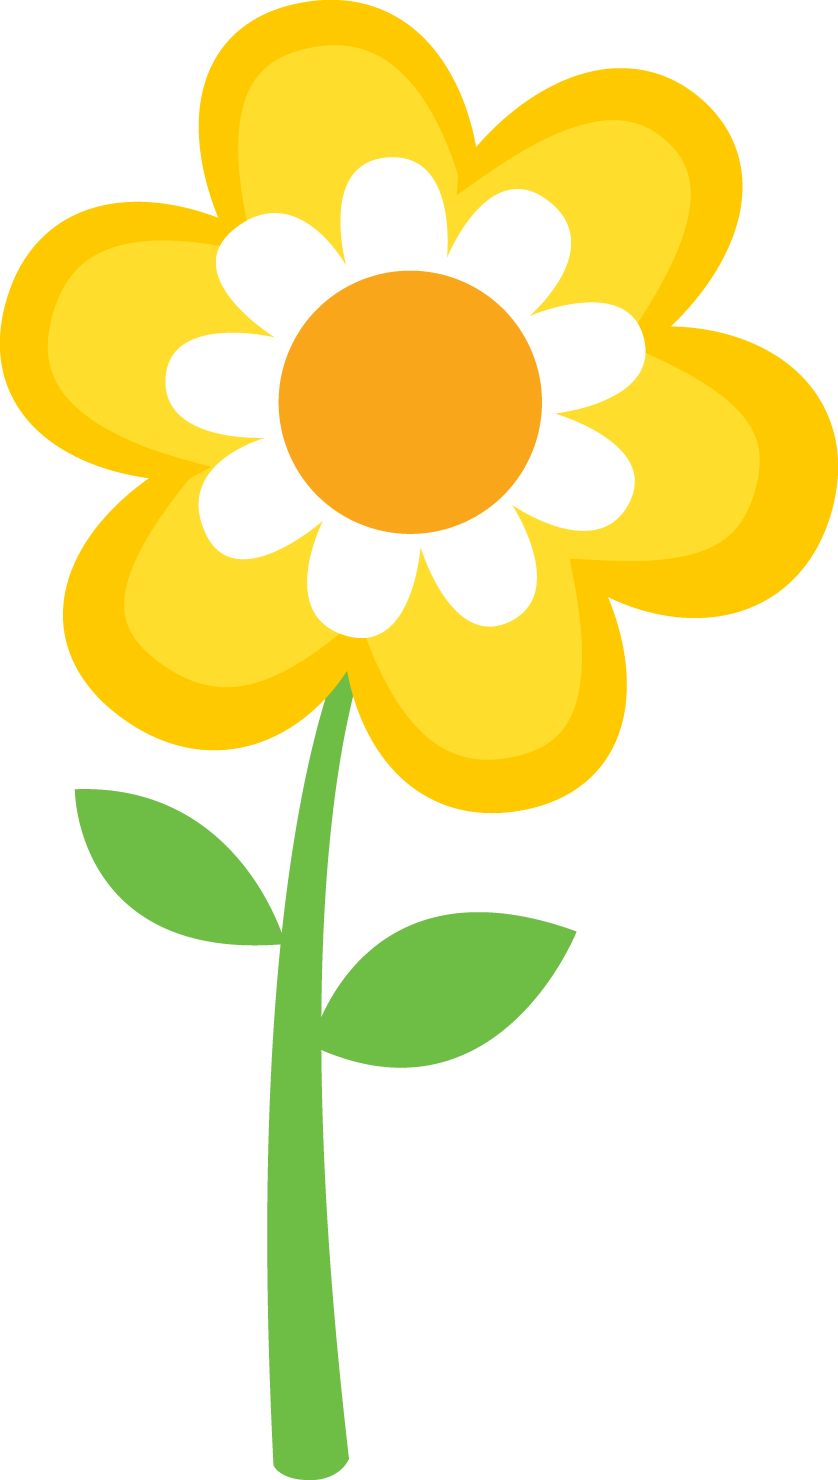 I rgqup koqy png. Garden clipart sunflower